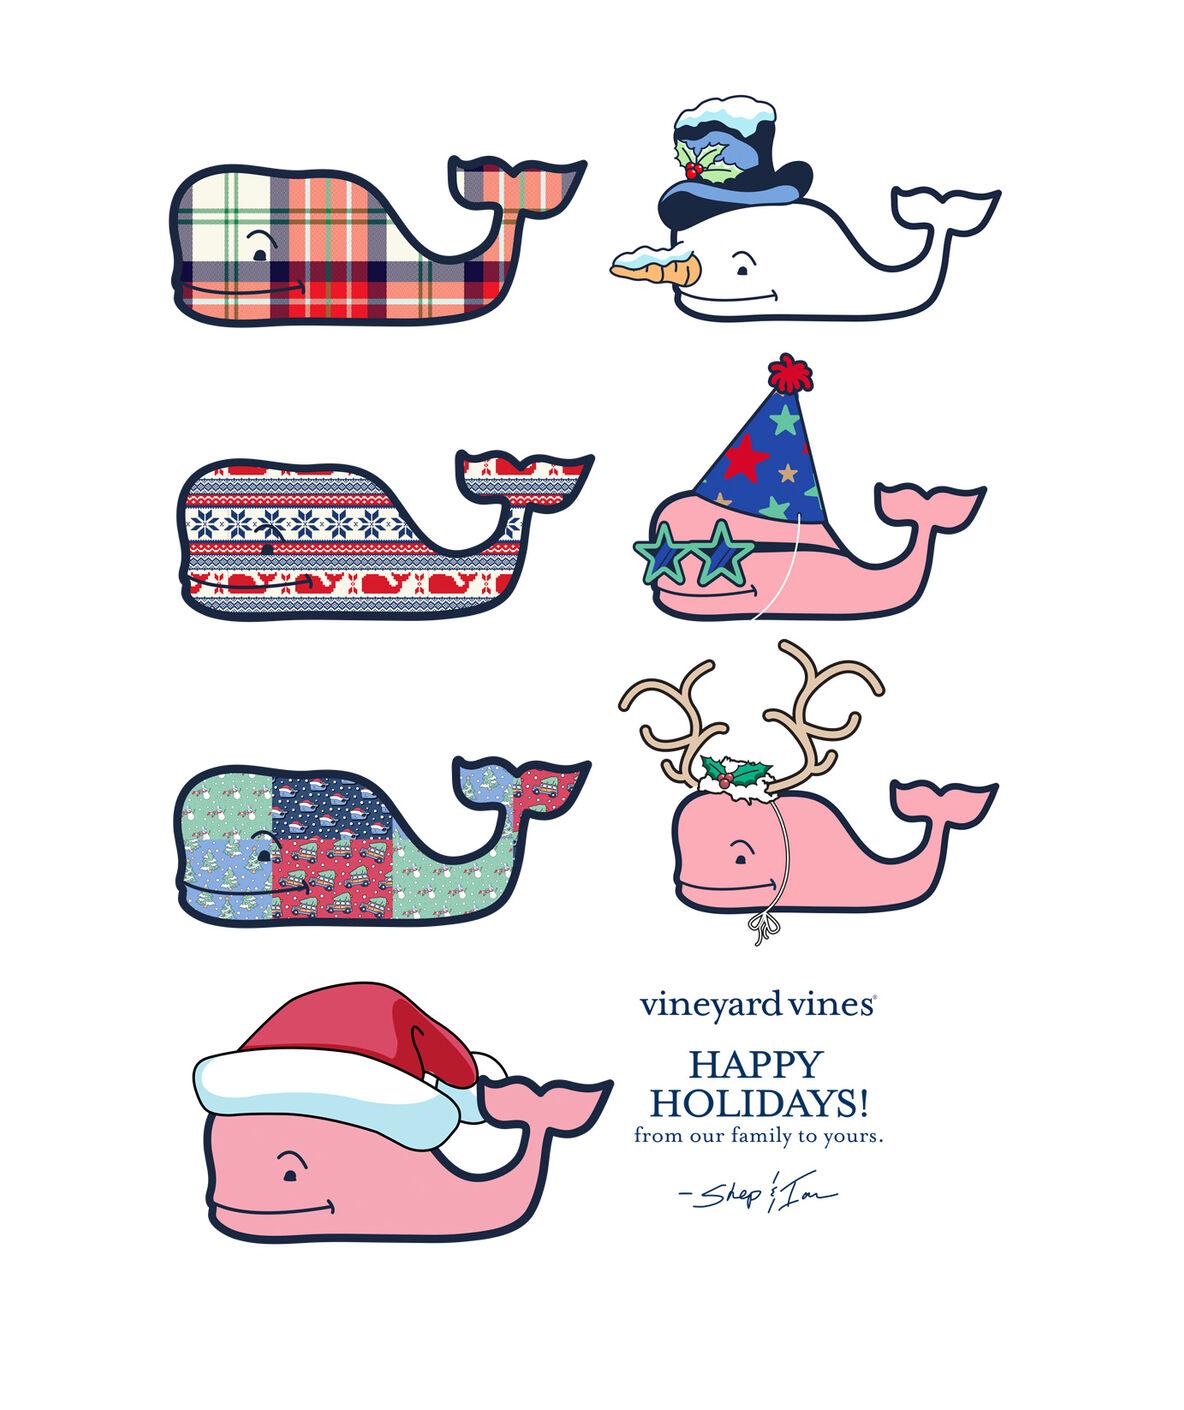 Shop Holiday Sticker Pack at vineyard vines